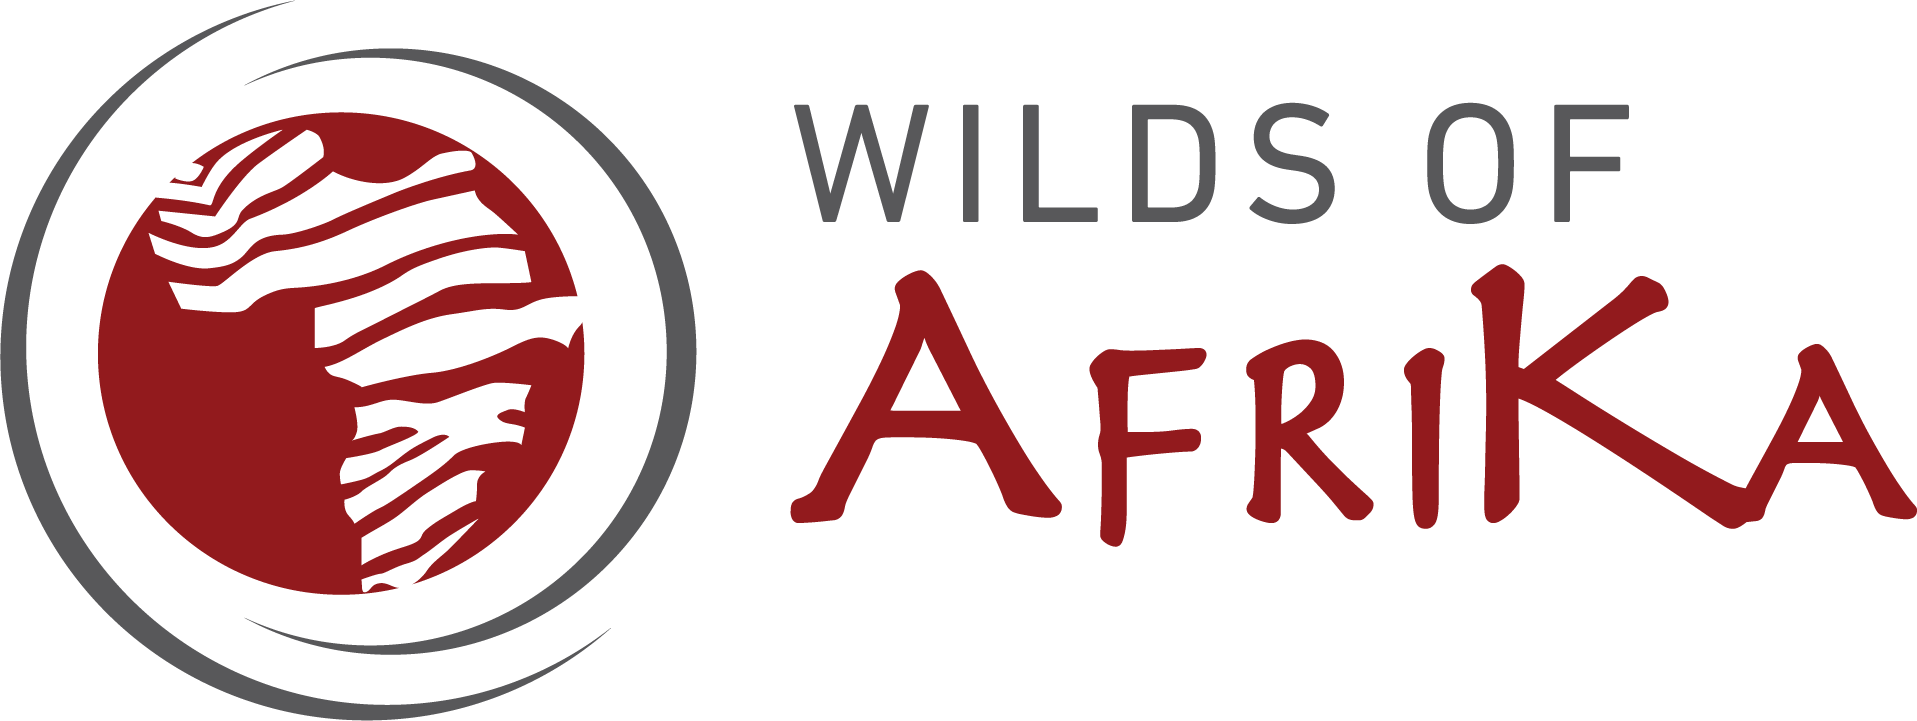 Wilds of Afrika - Südafrika Reise individuell